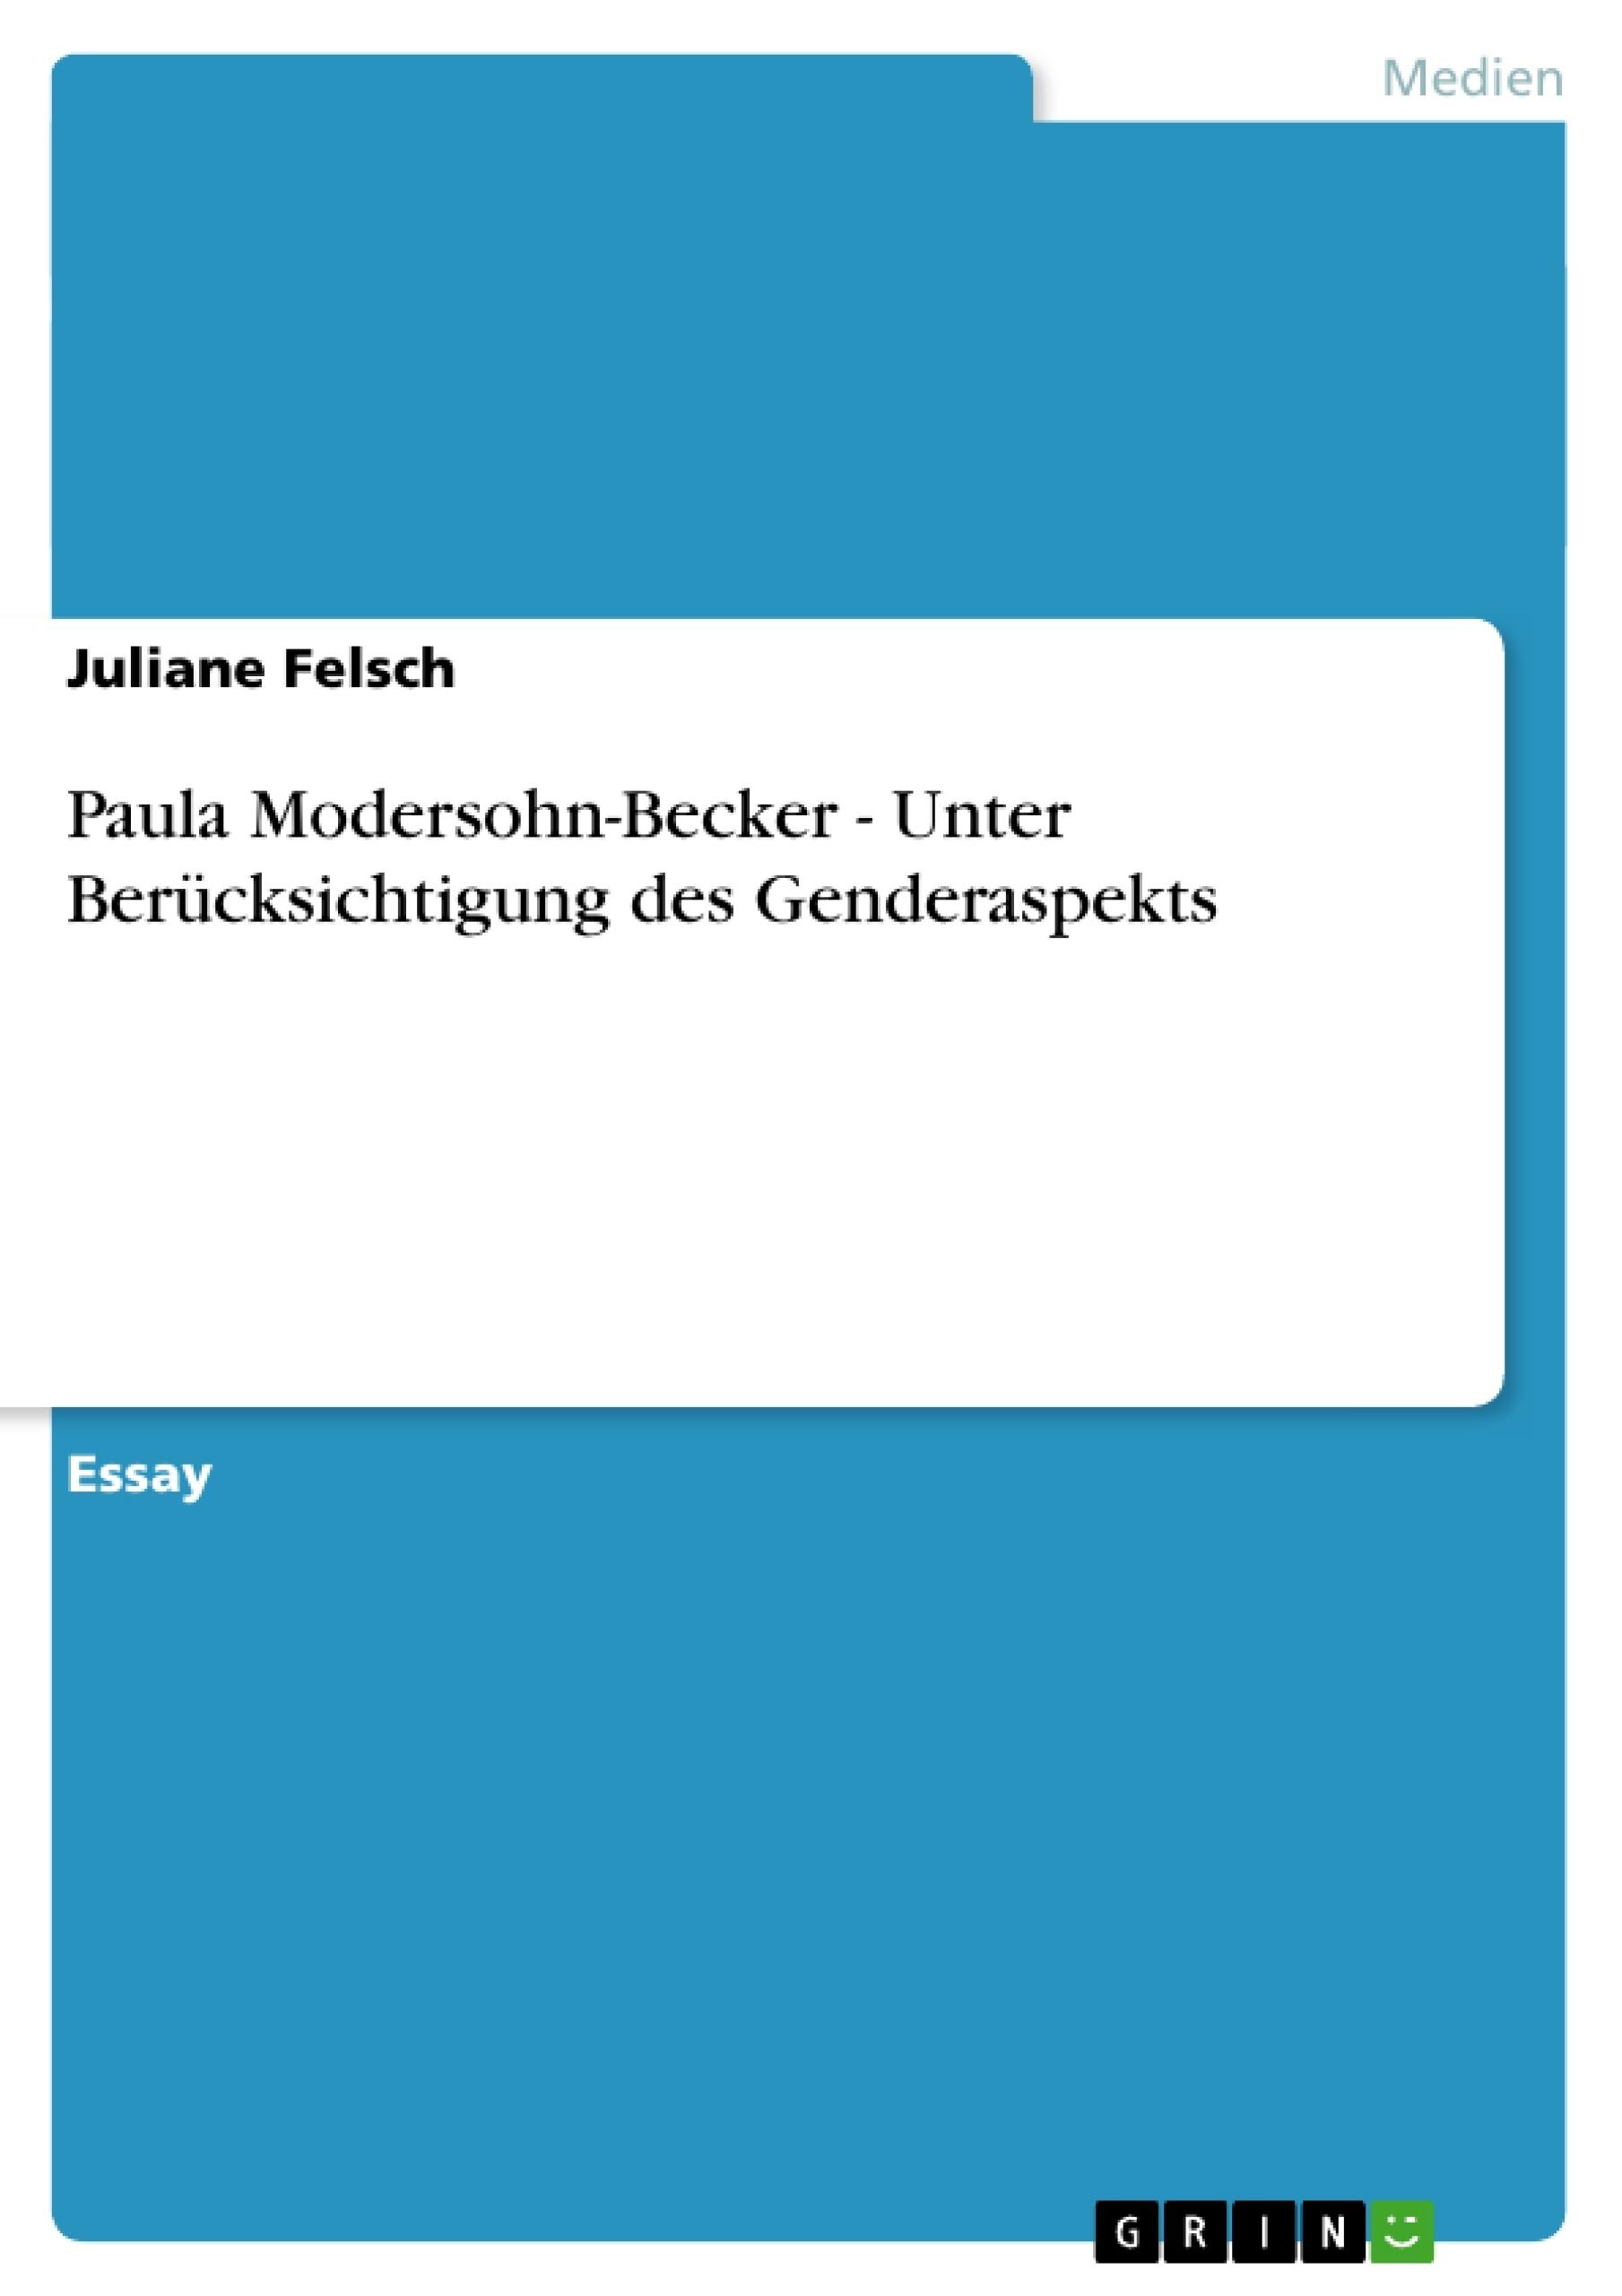 Titel: Paula Modersohn-Becker - Unter Berücksichtigung des Genderaspekts